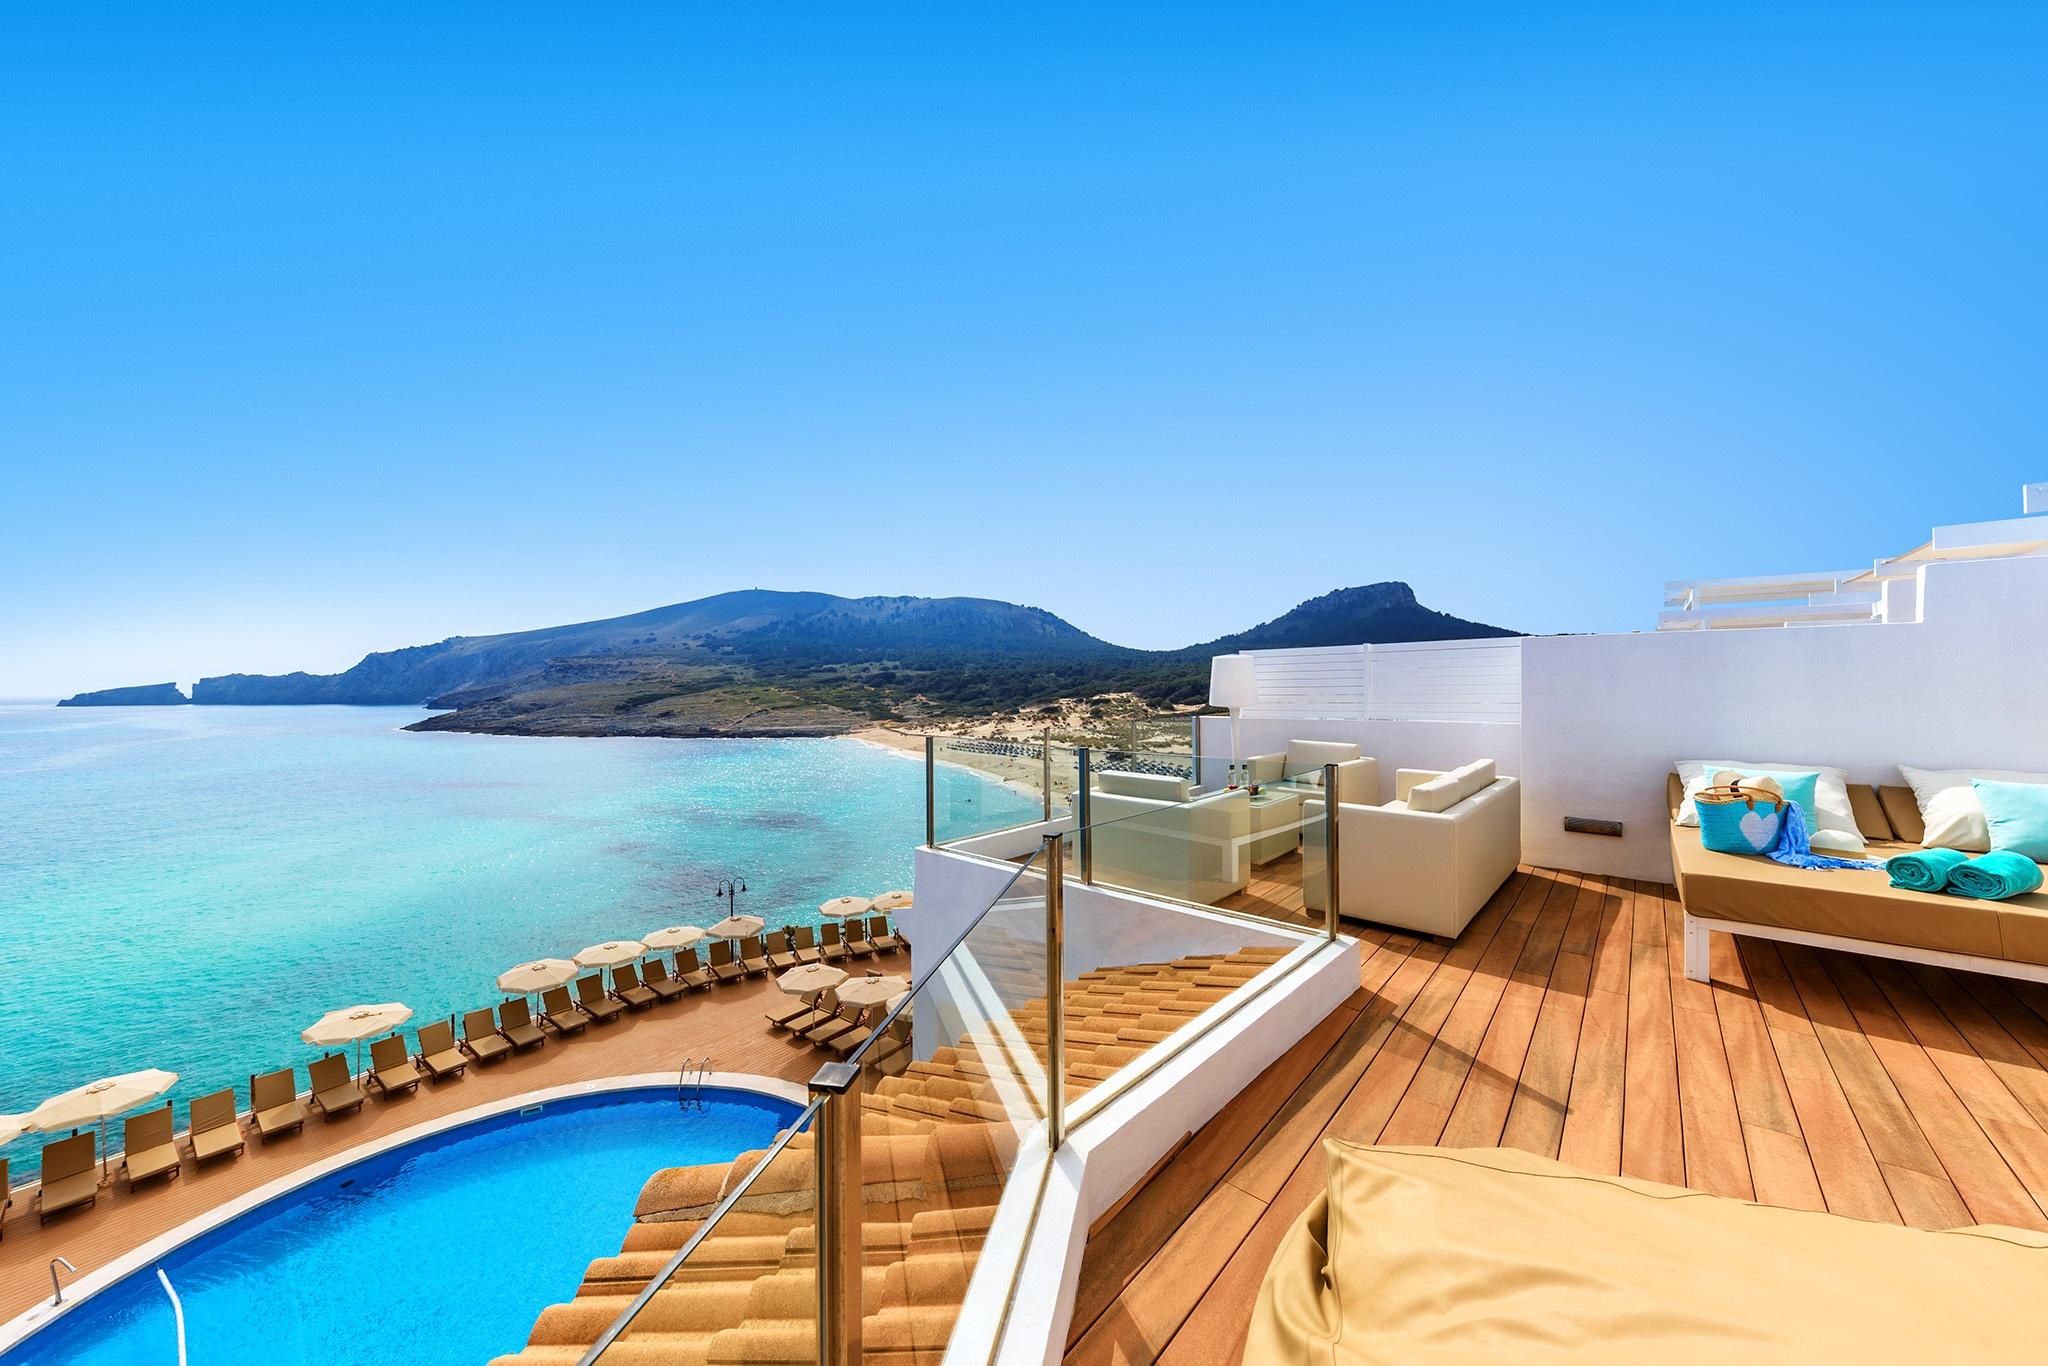 royal terrace selection club vista mar2.jpg